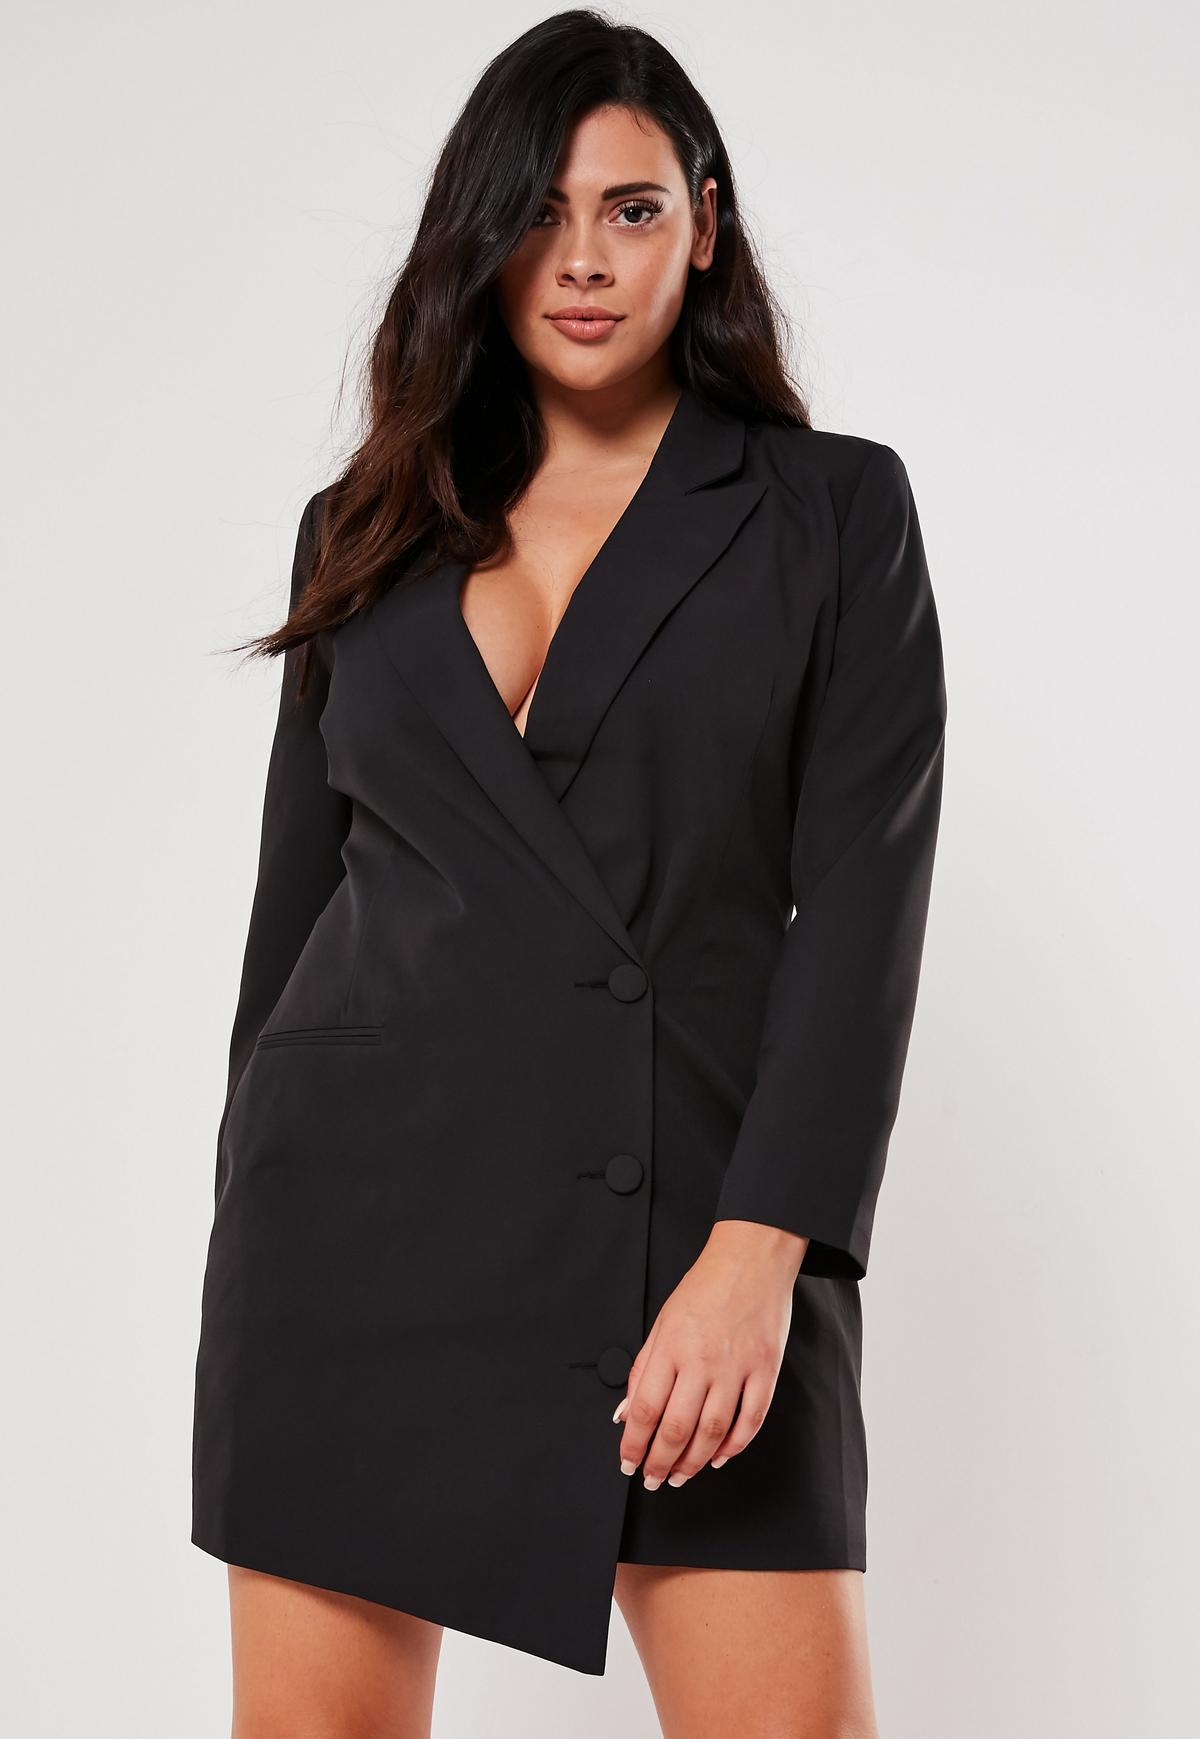 Plus Size Black Button Front Blazer Dress